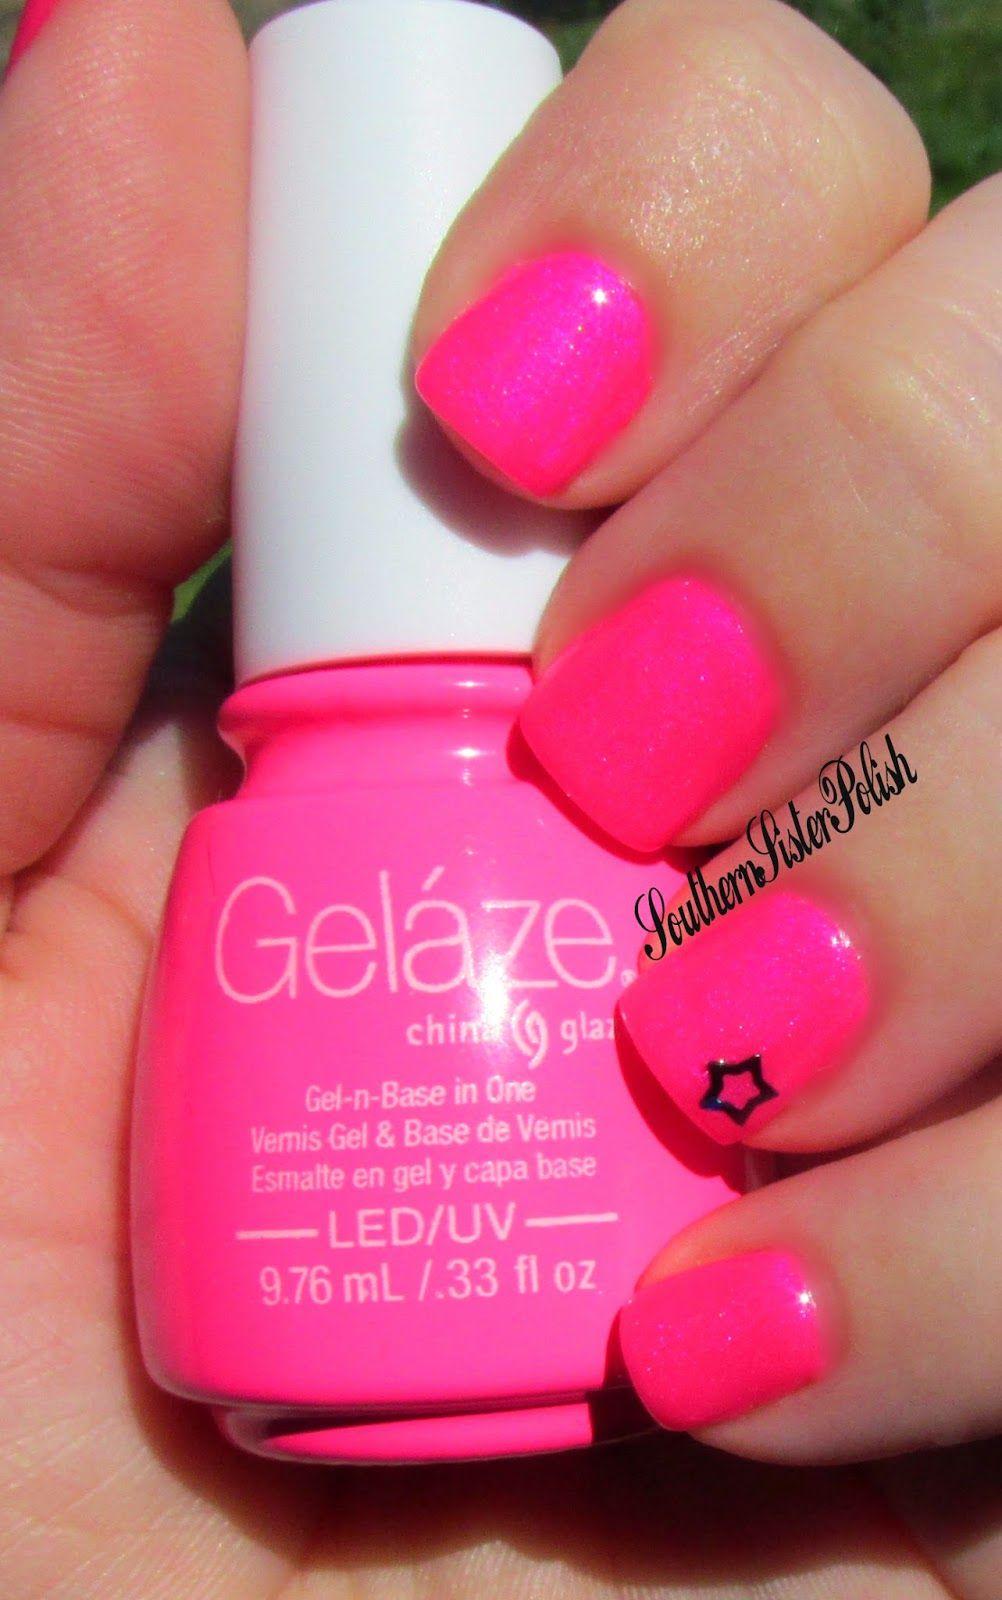 Southern Sister Polish: Pink Voltage Gelaze | nails | Pinterest ...